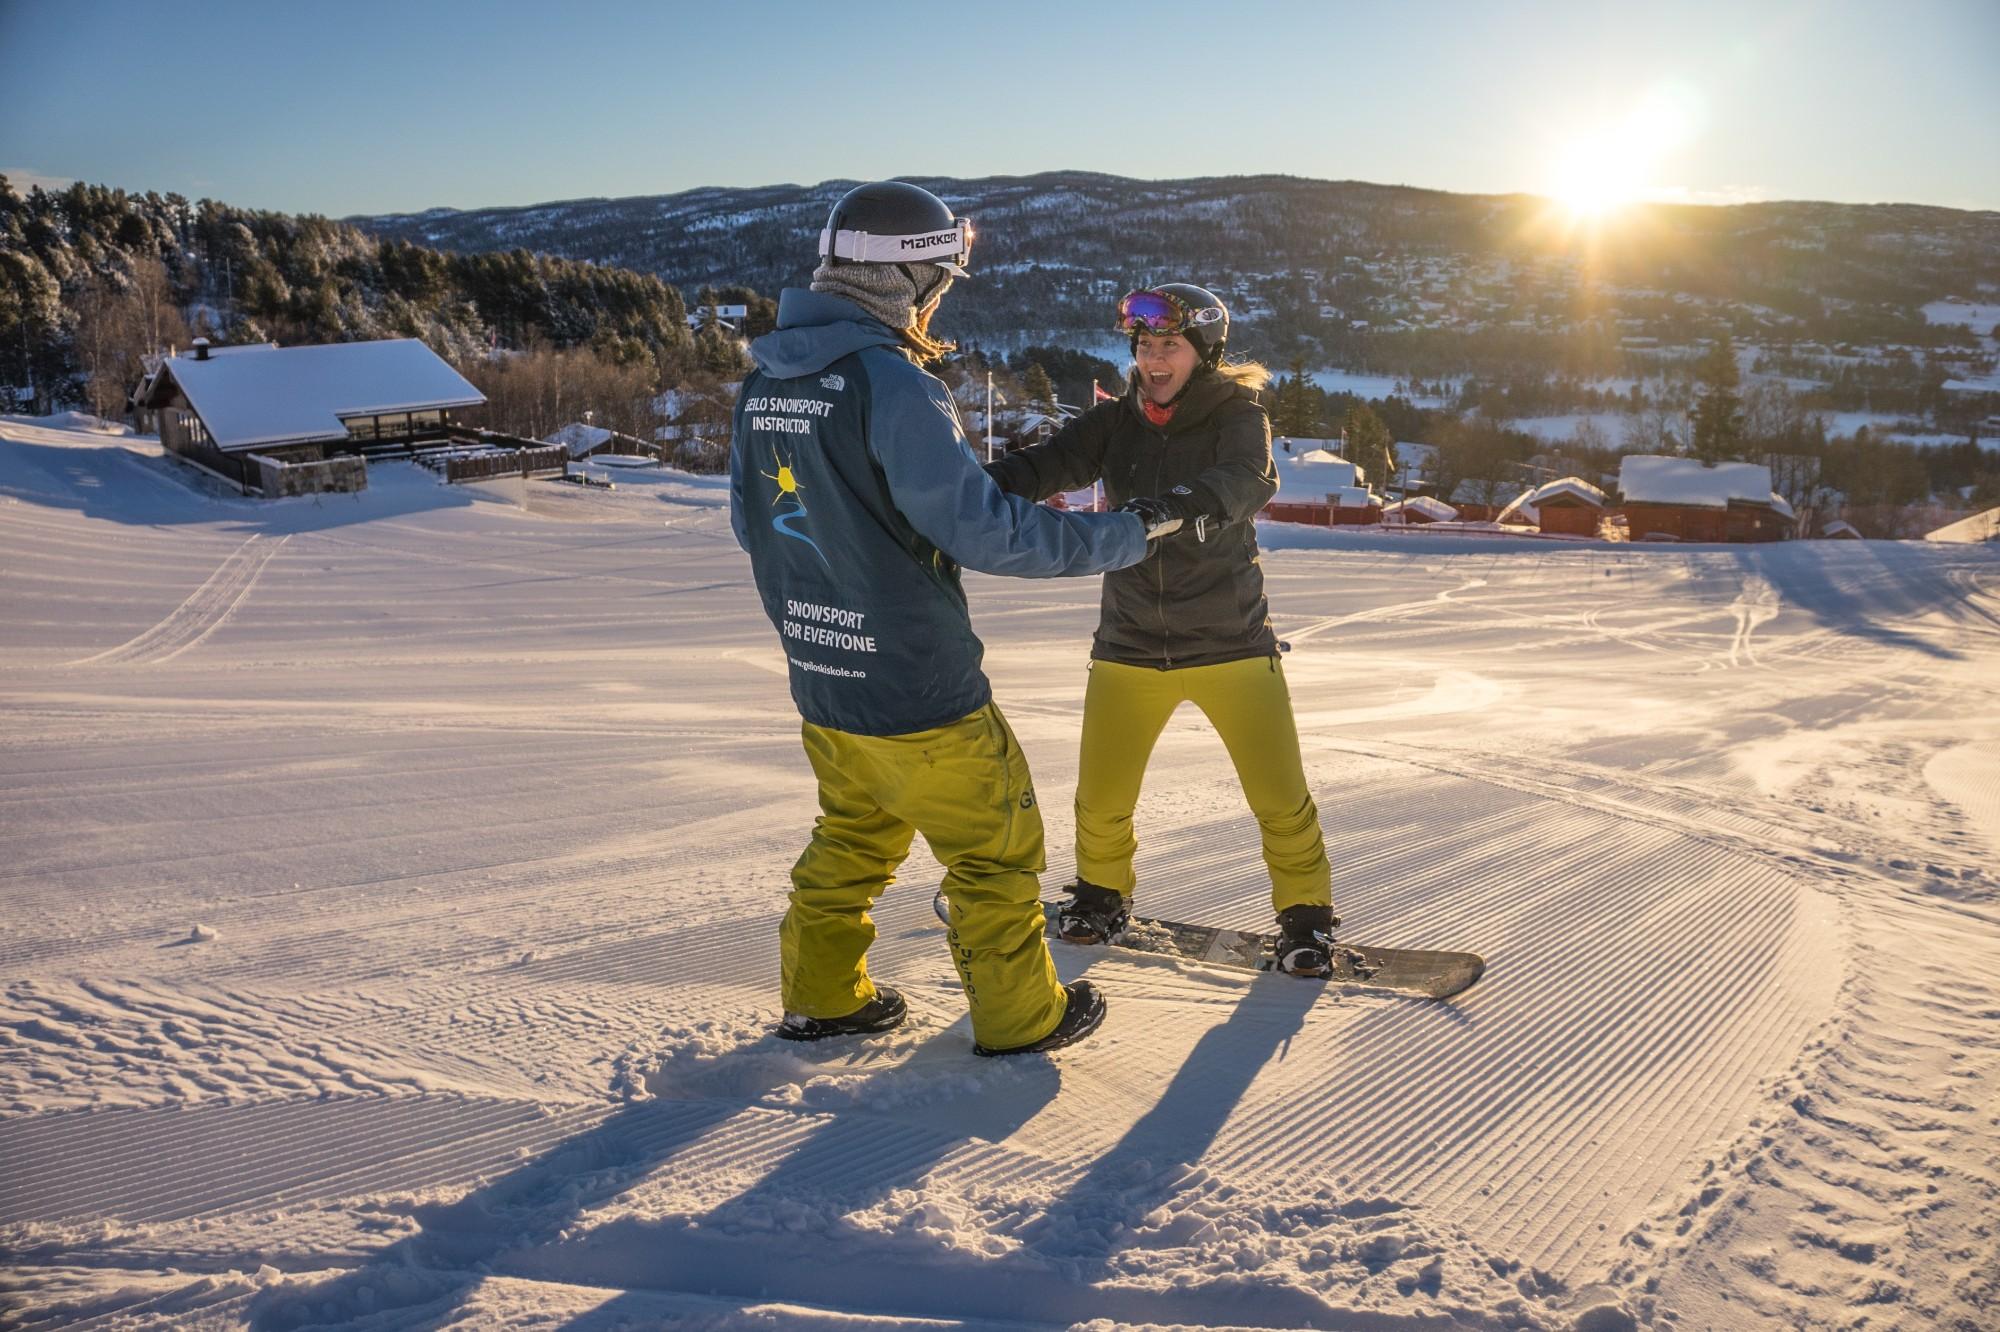 Snowboard Taster